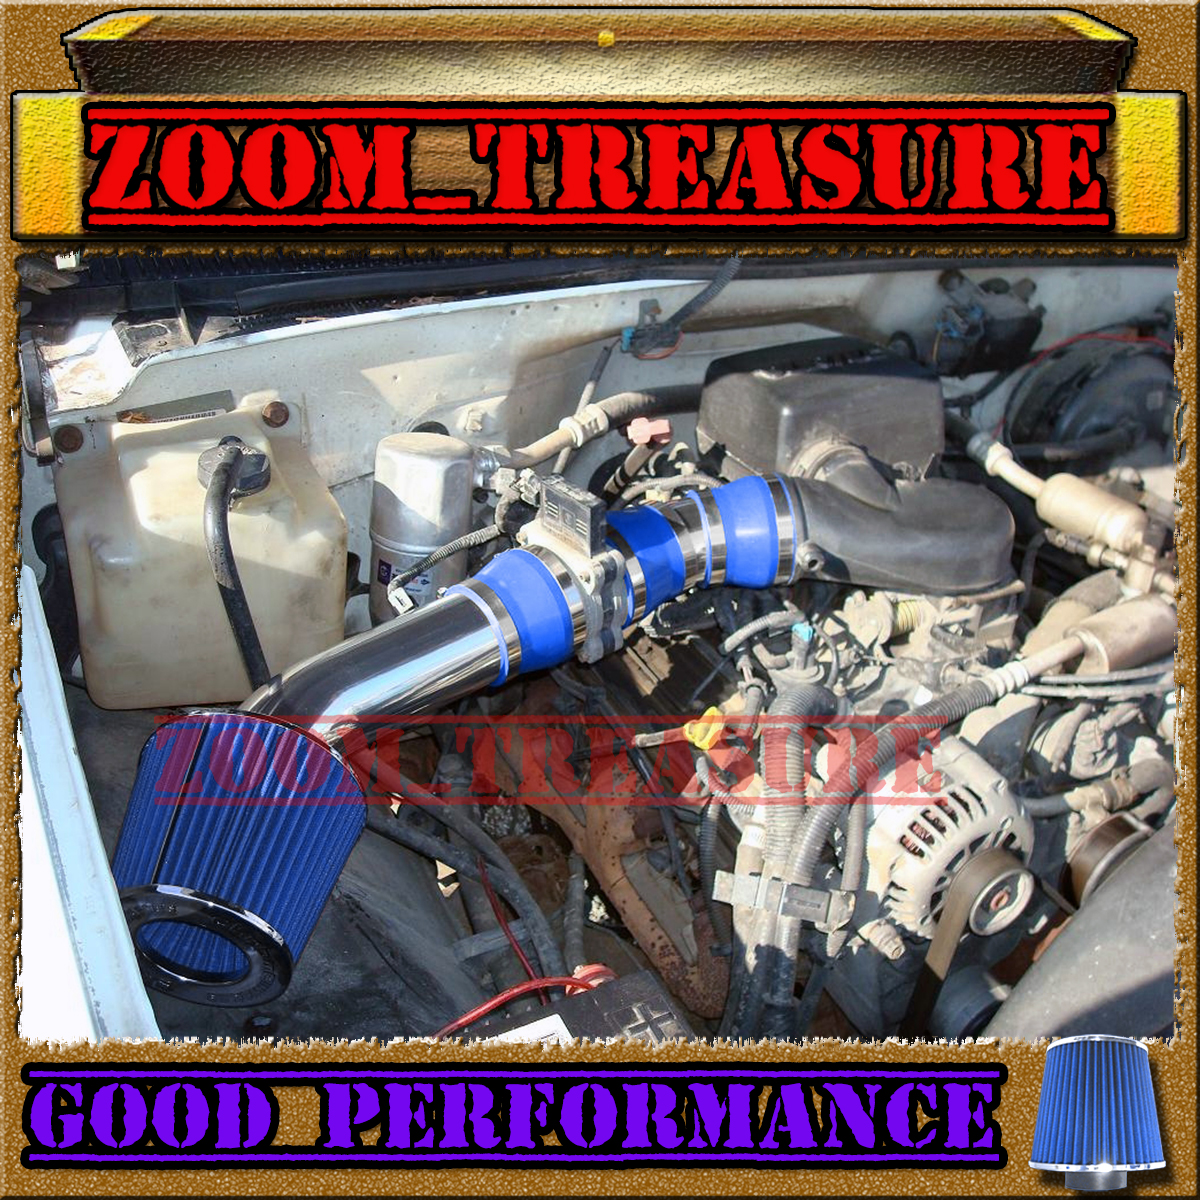 BLUE 1996-2000//96-00 GMC//CHEVY//CADILLAC SUV//TRUCK 5.0L 5.7L V8 AIR INTAKE KIT 2P